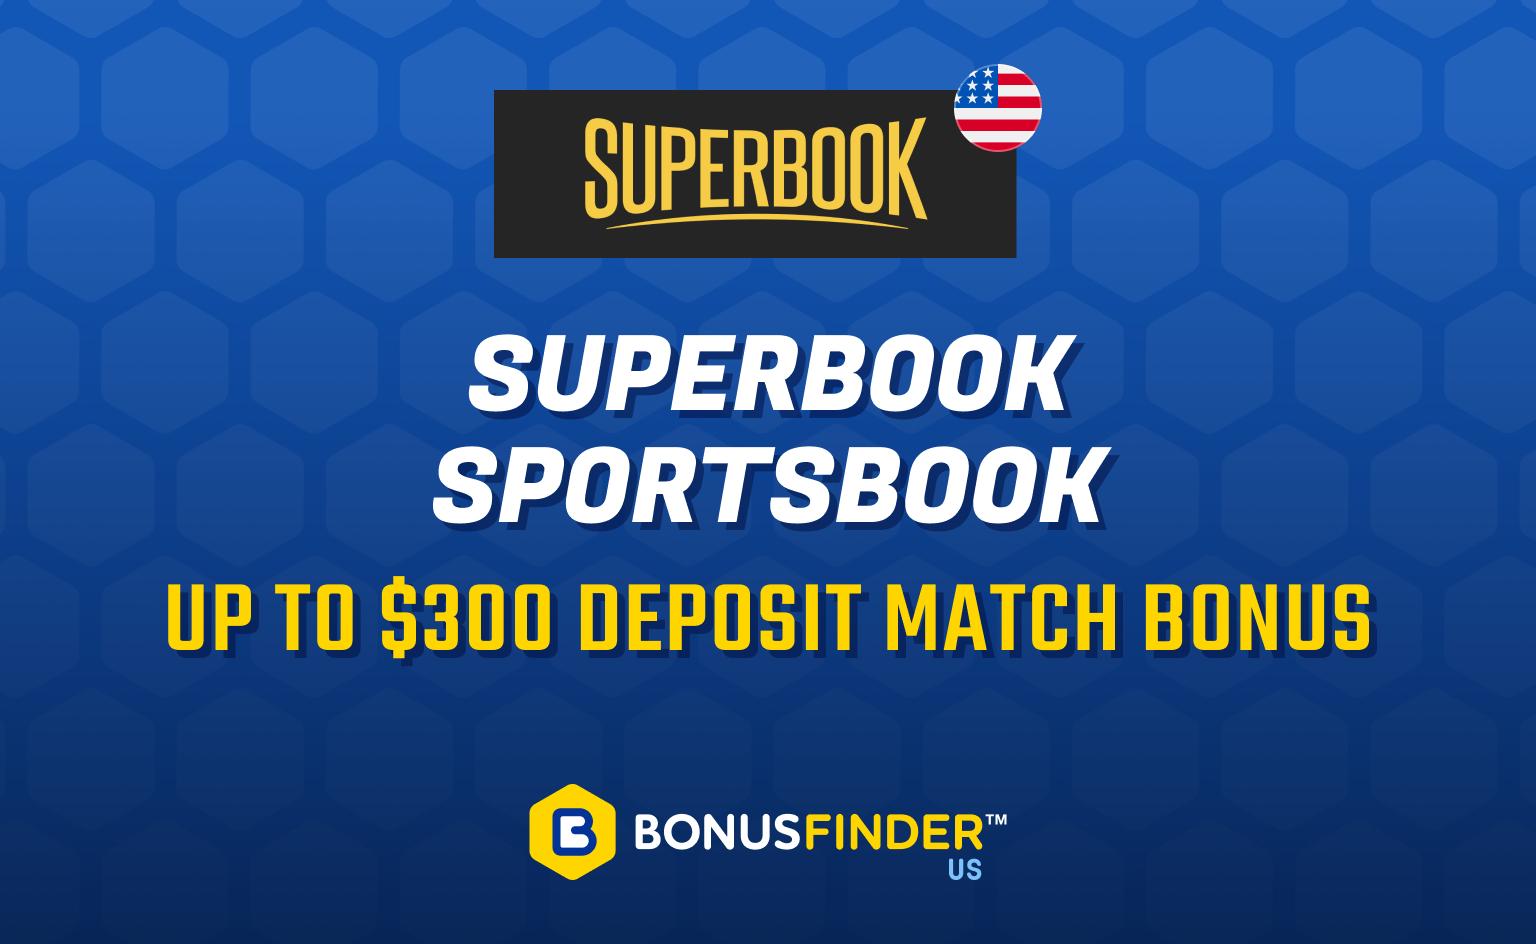 SuperBook Sportsbook bonus